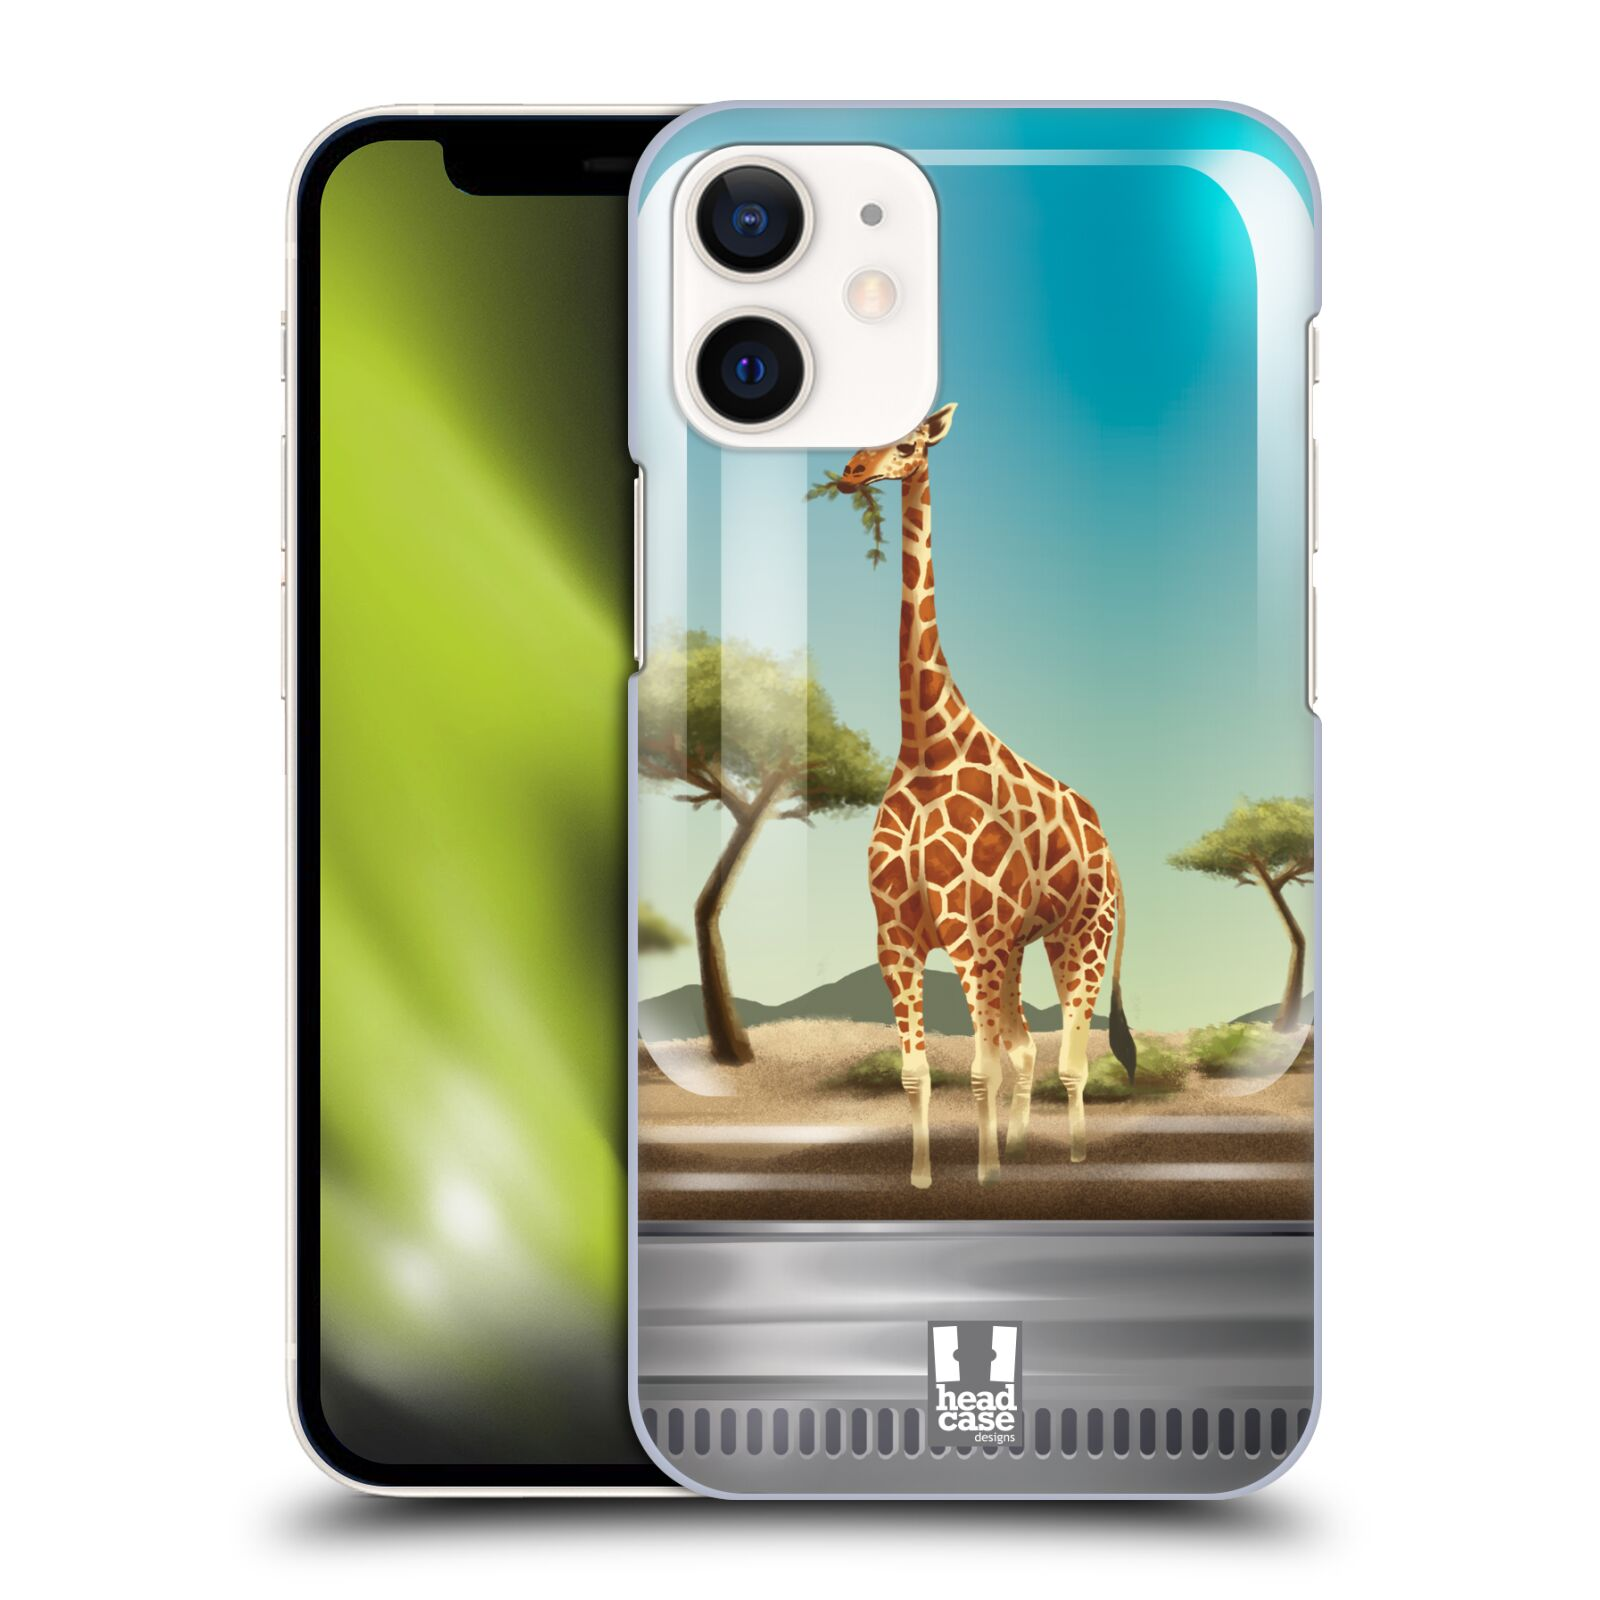 Plastový obal na mobil Apple Iphone 12 MINI vzor Zvířátka v těžítku žirafa